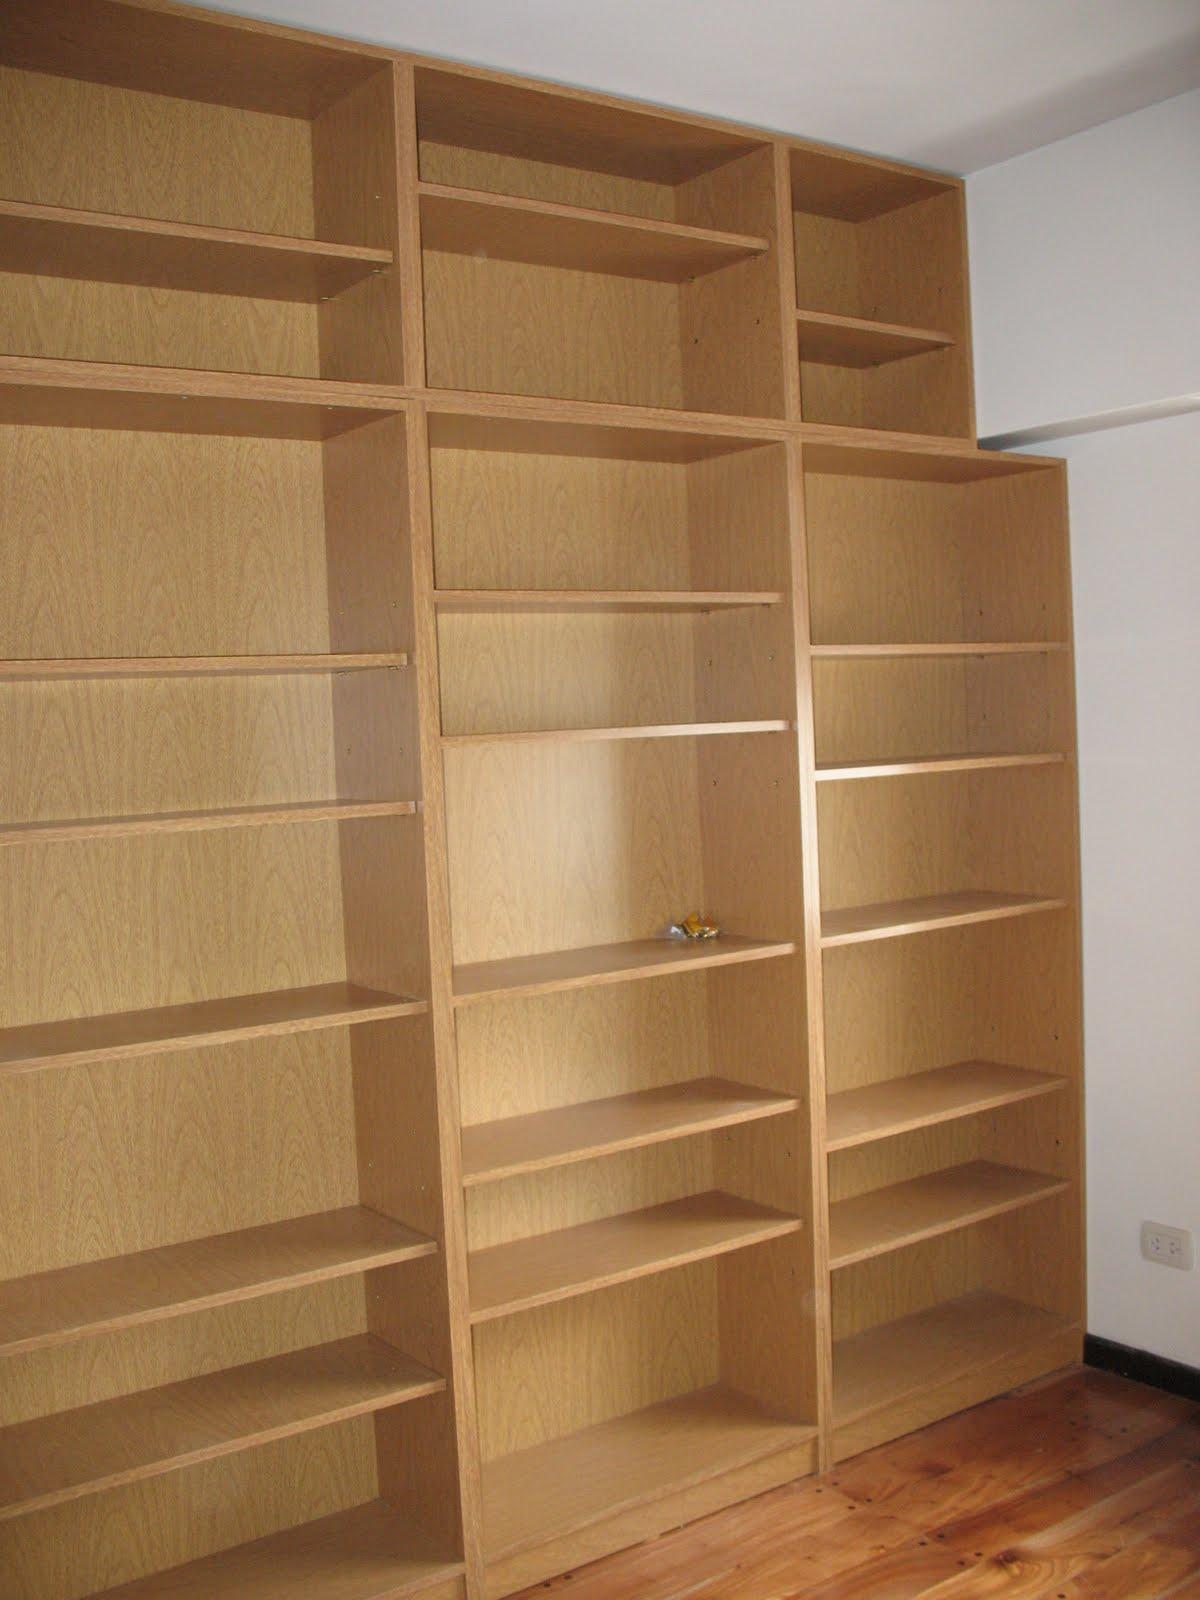 canell argentina construcciones muebles a medida